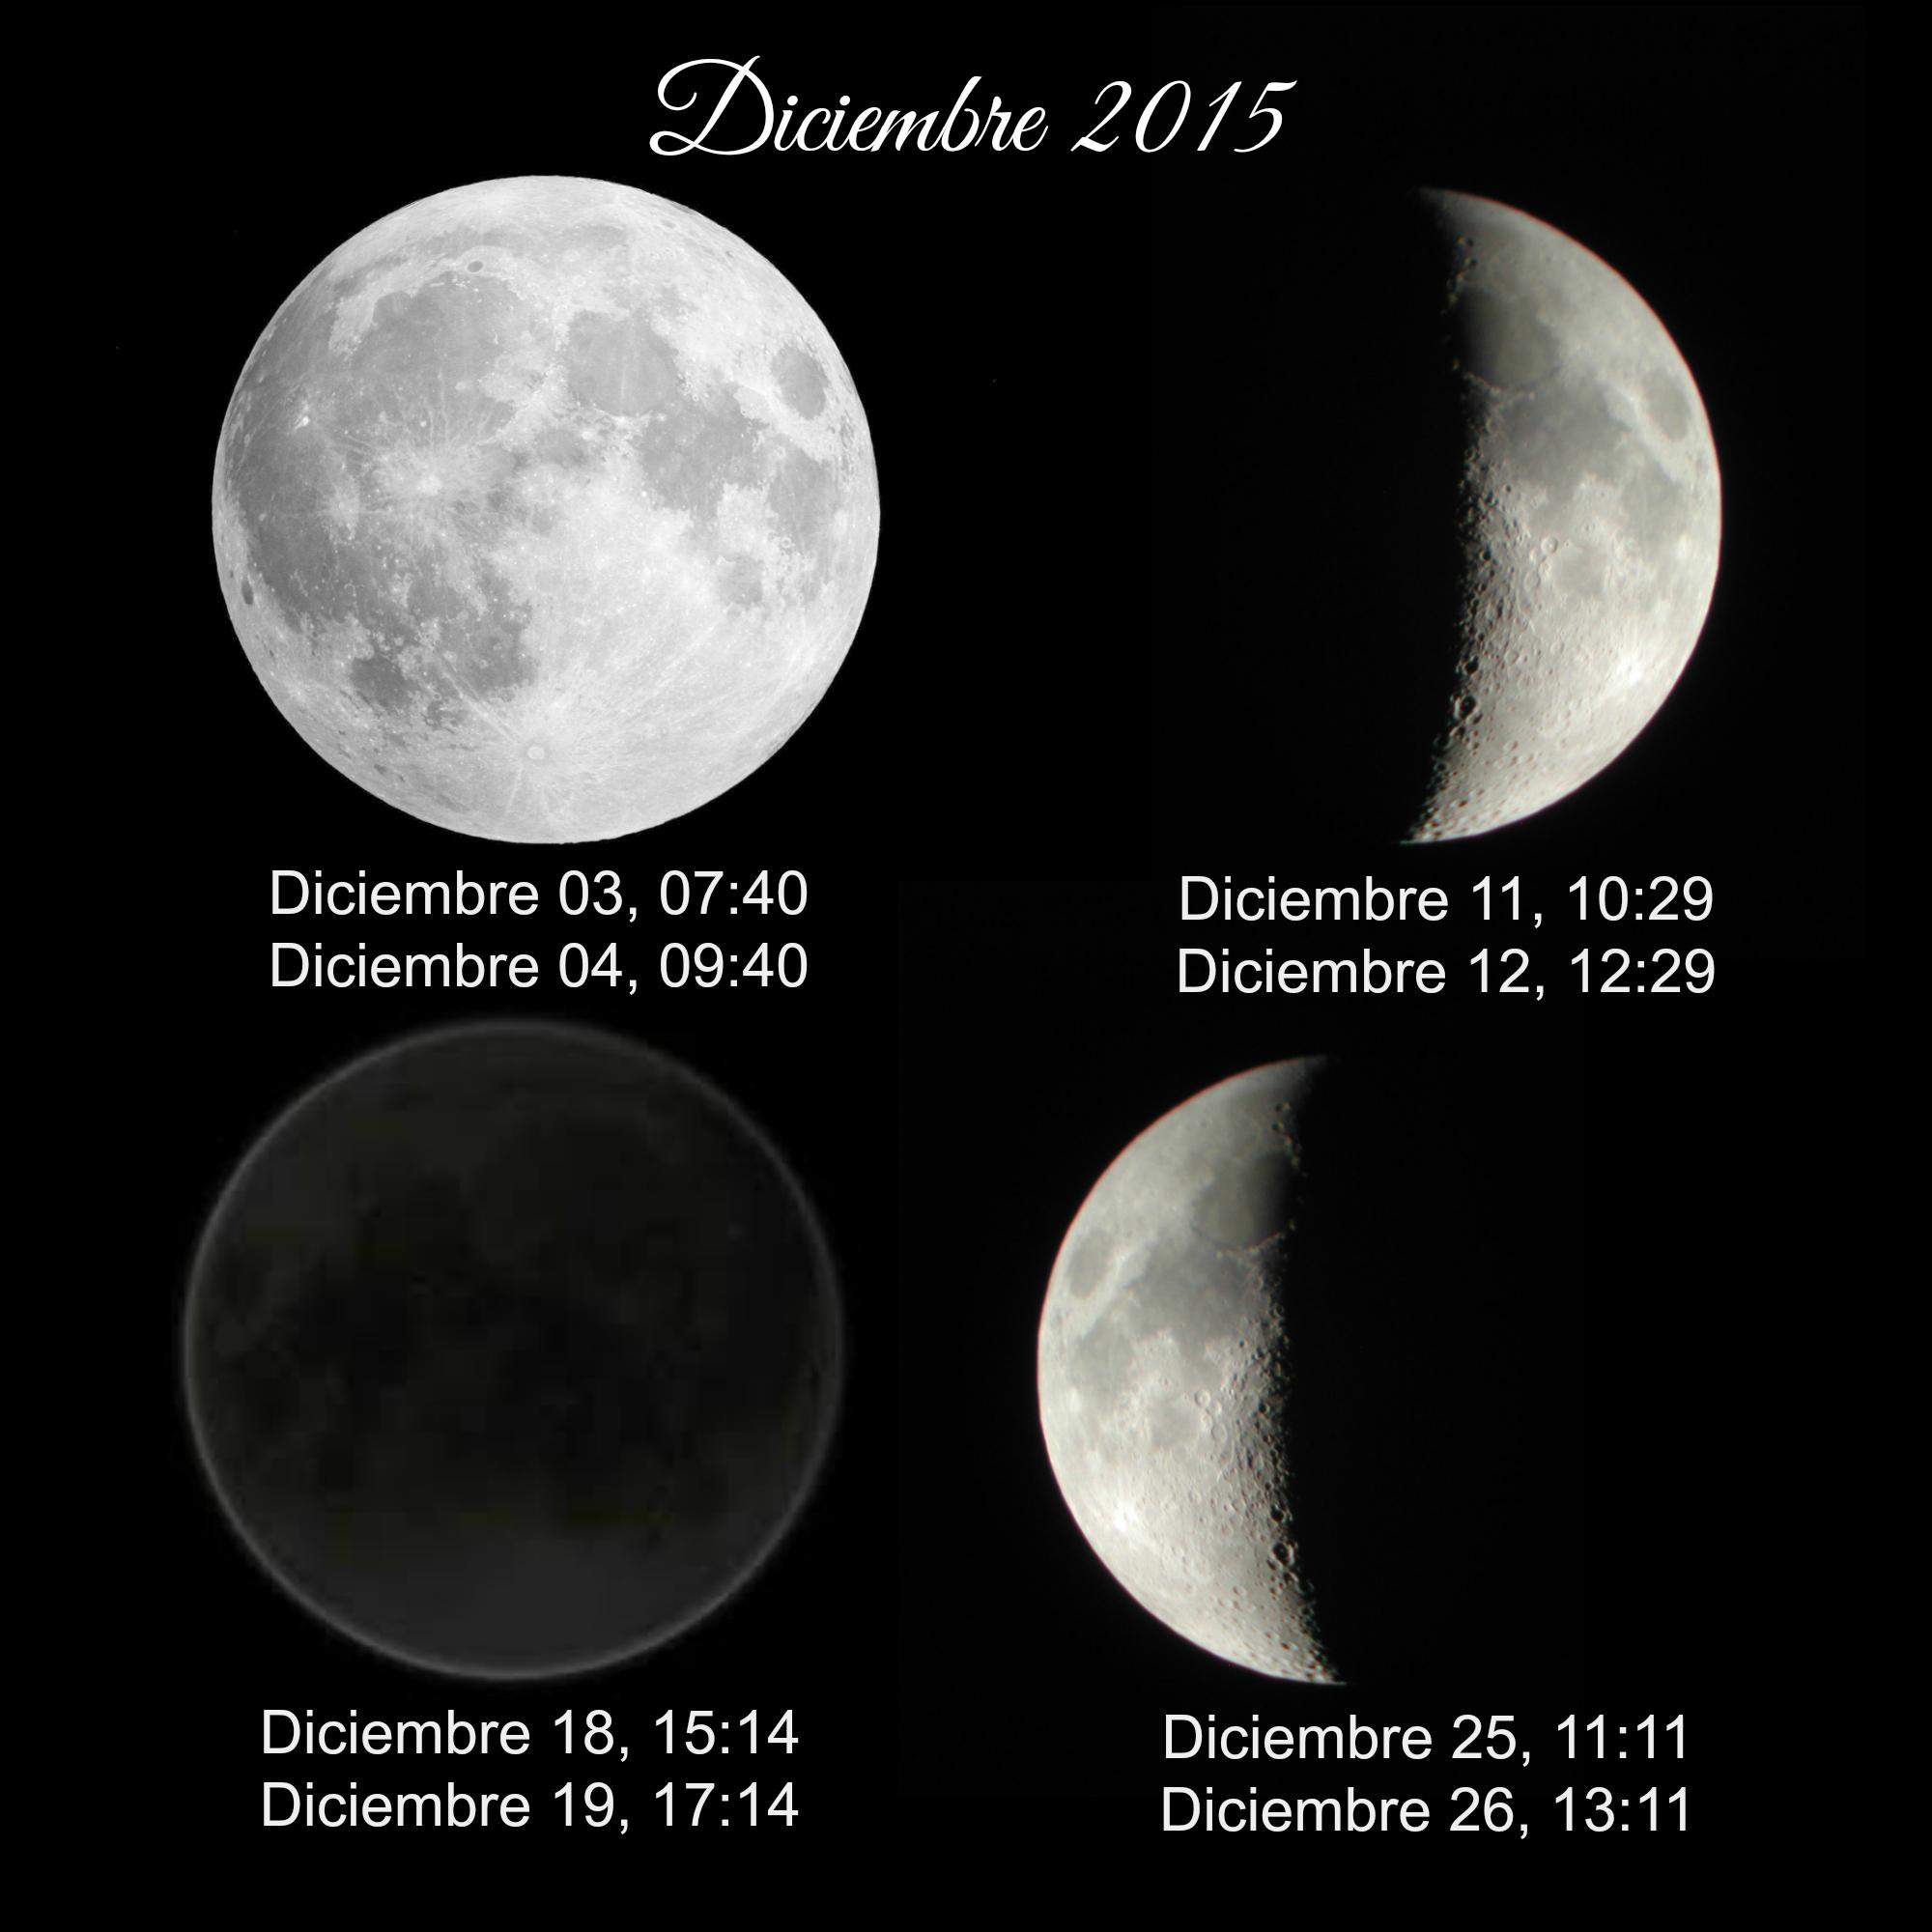 Mes a mes calendario de la dieta lunar 2015 connexions for Calendario lunar junio